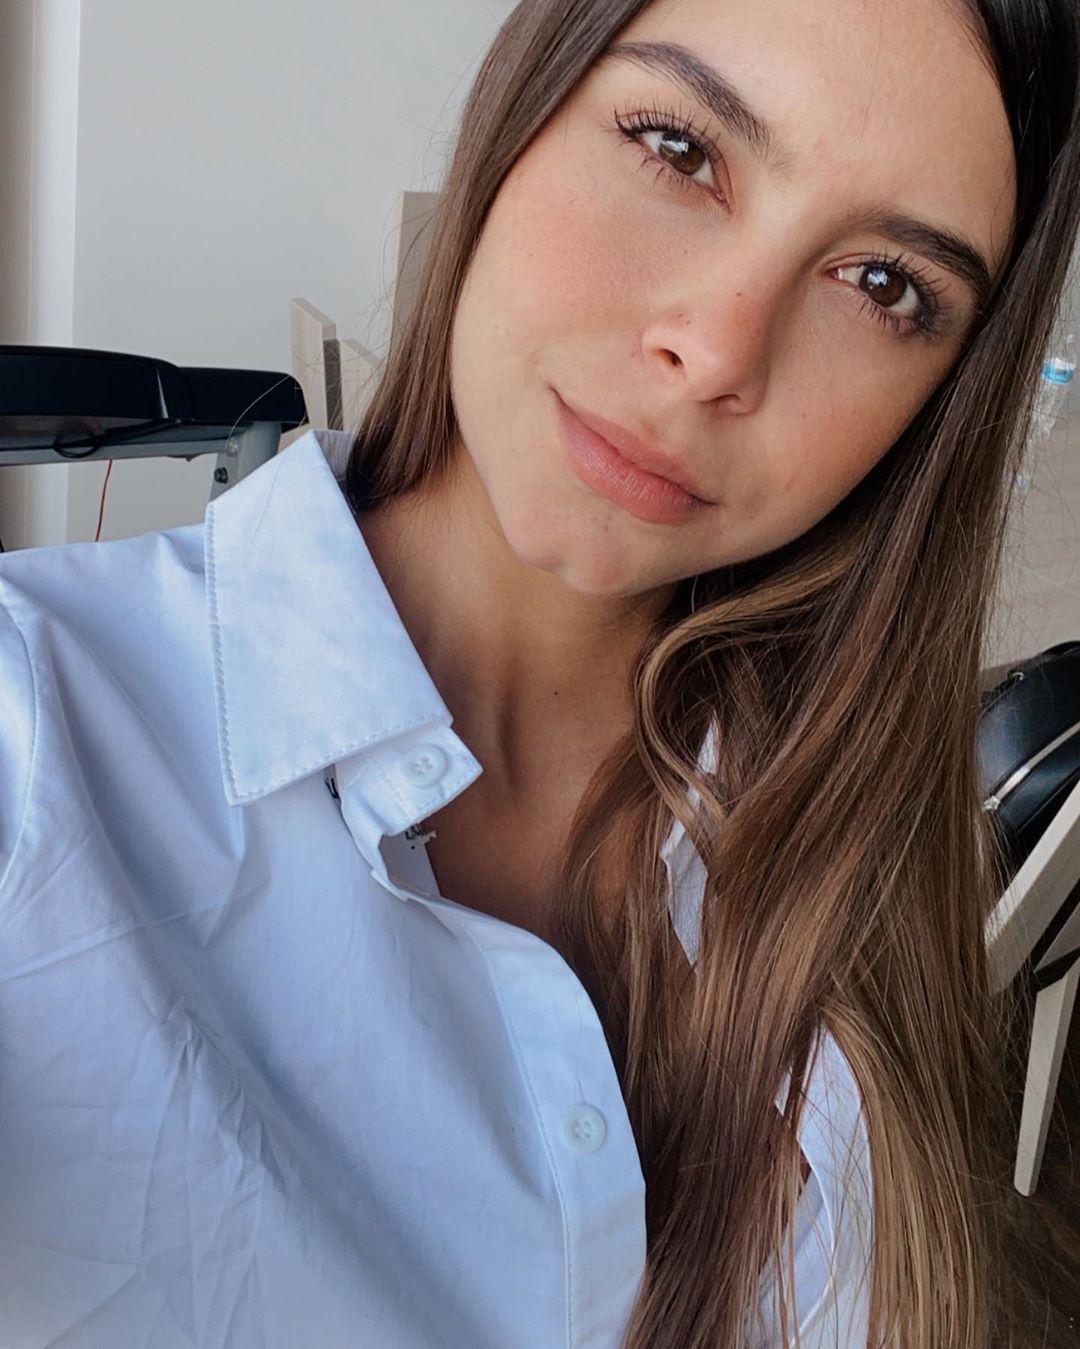 Daniela-Medina-Wallpapers-Insta-FIt-Bio-4